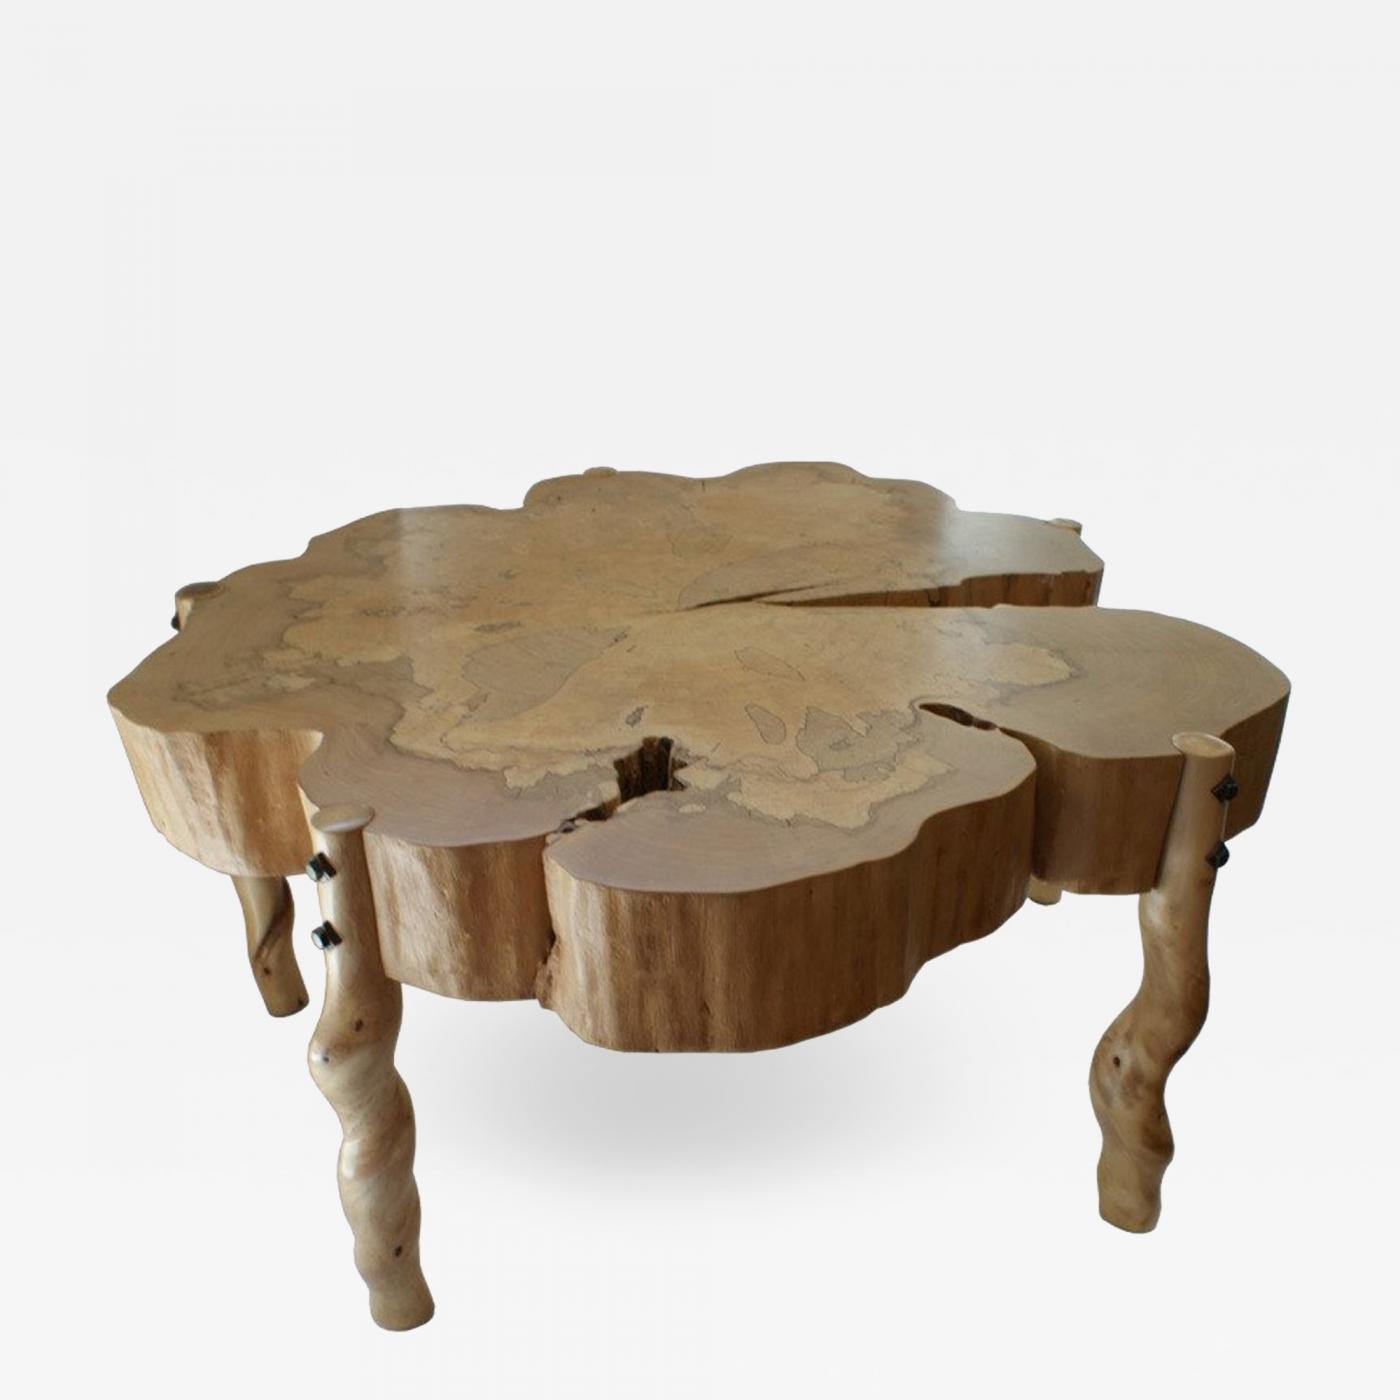 Maple Wood Coffee Table.David Ebner David N Ebner Spalted Maple Wood And Sassafras Coffee Table